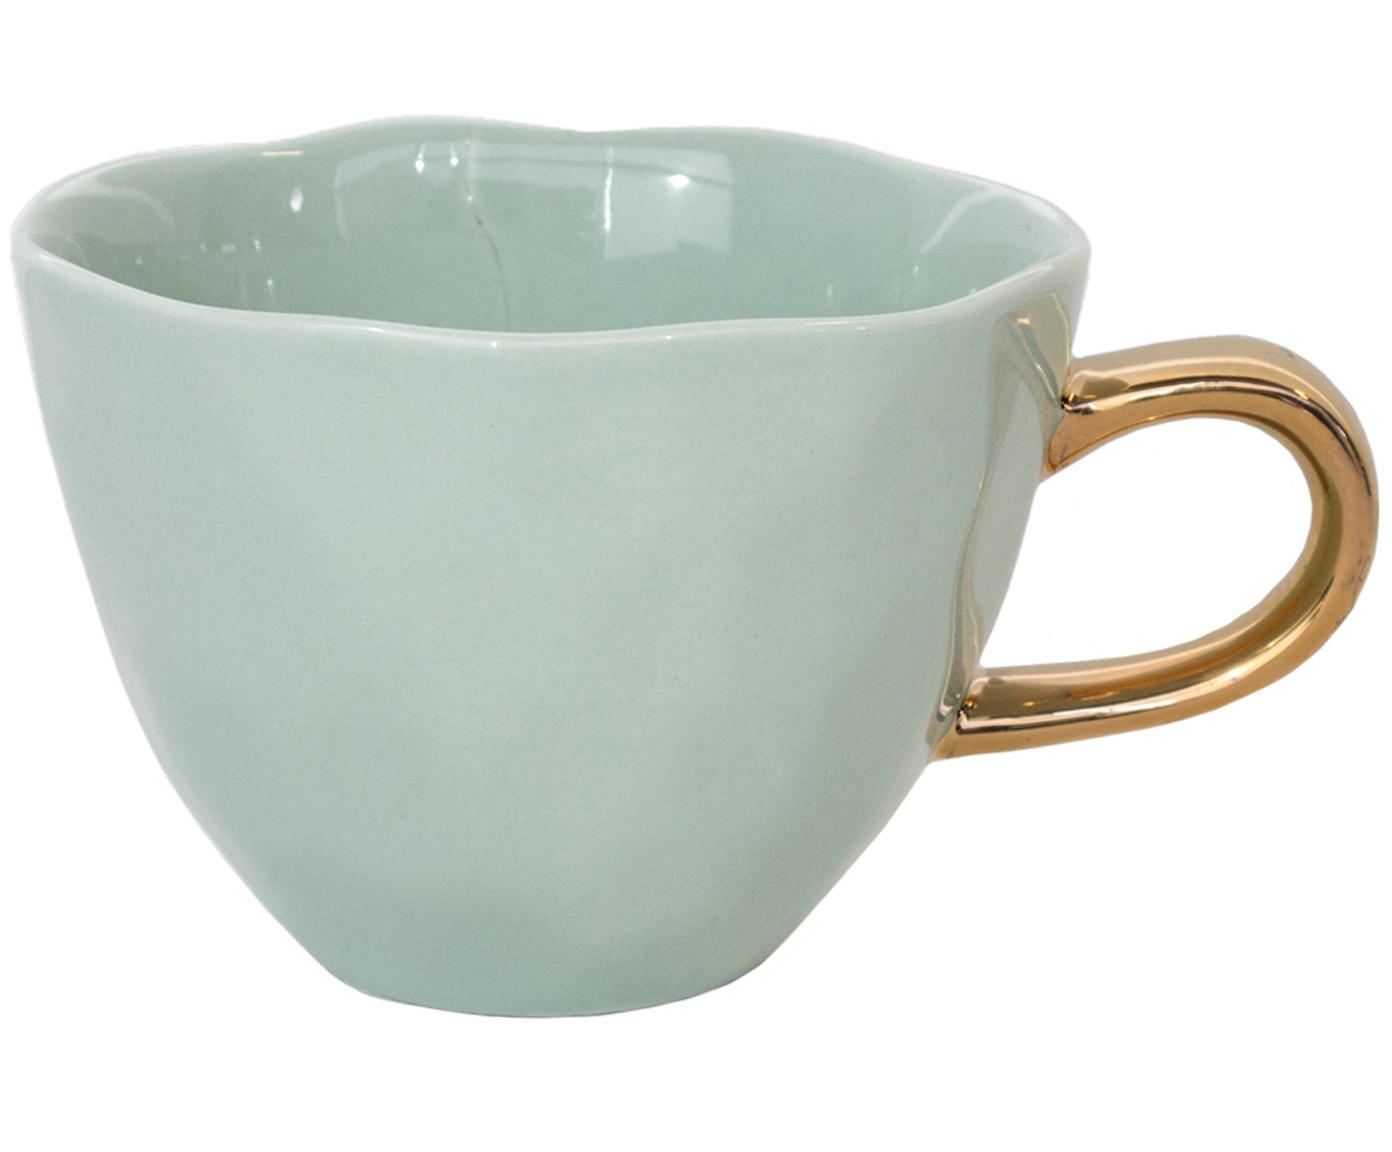 Koffiekopje Good Morning, New Bone China, Mintgroen, goudkleurig, Ø 11 x H 8 cm